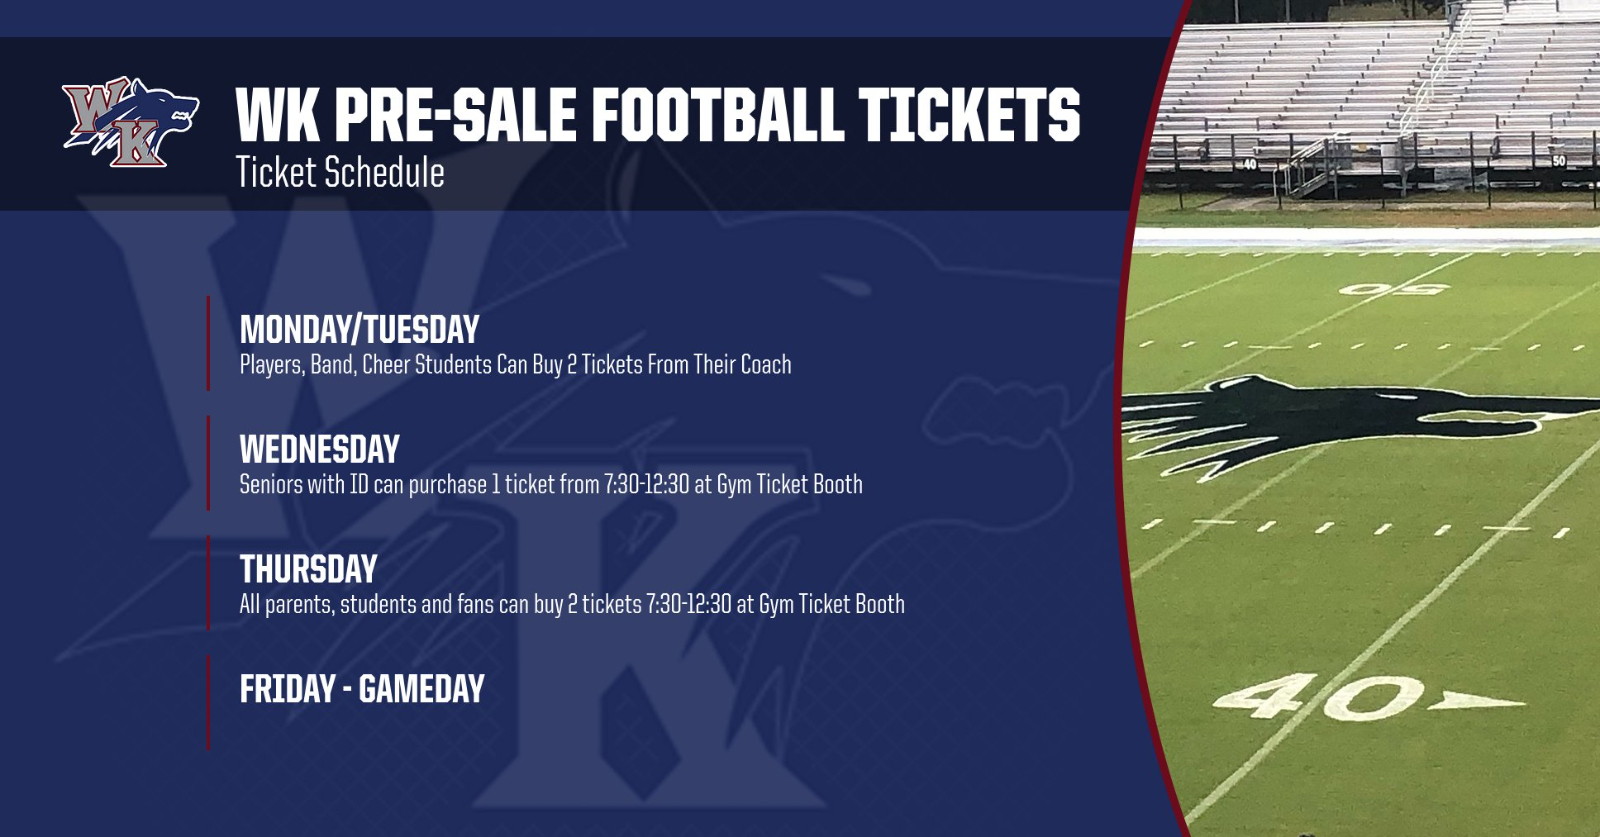 WK Football Pre-Sale Ticket Schedule